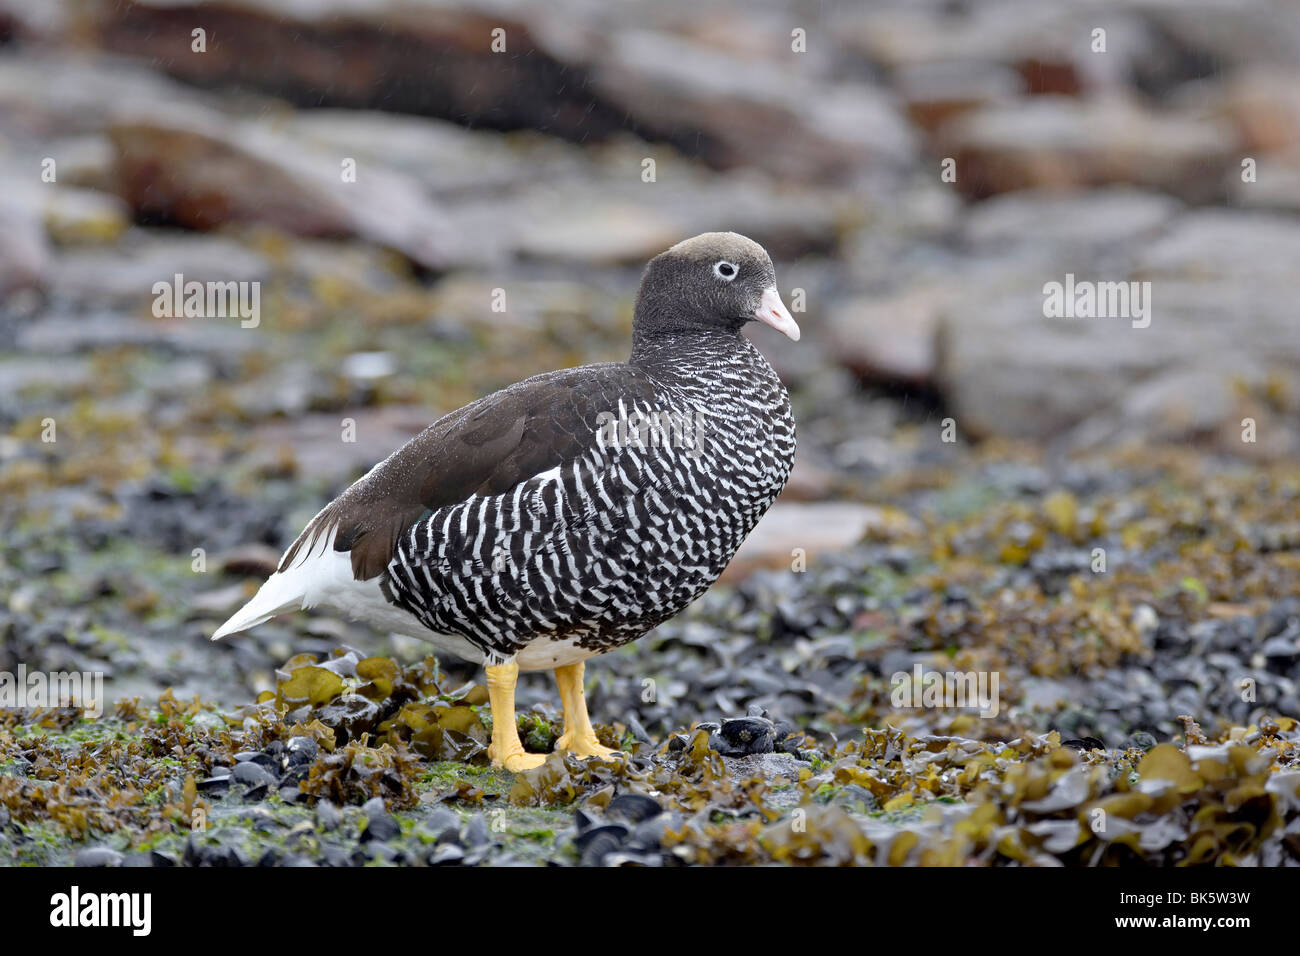 Female Falkland flightless steamer duck (Tachyeres brachypterus), New Island, Falkland Islands, South America - Stock Image